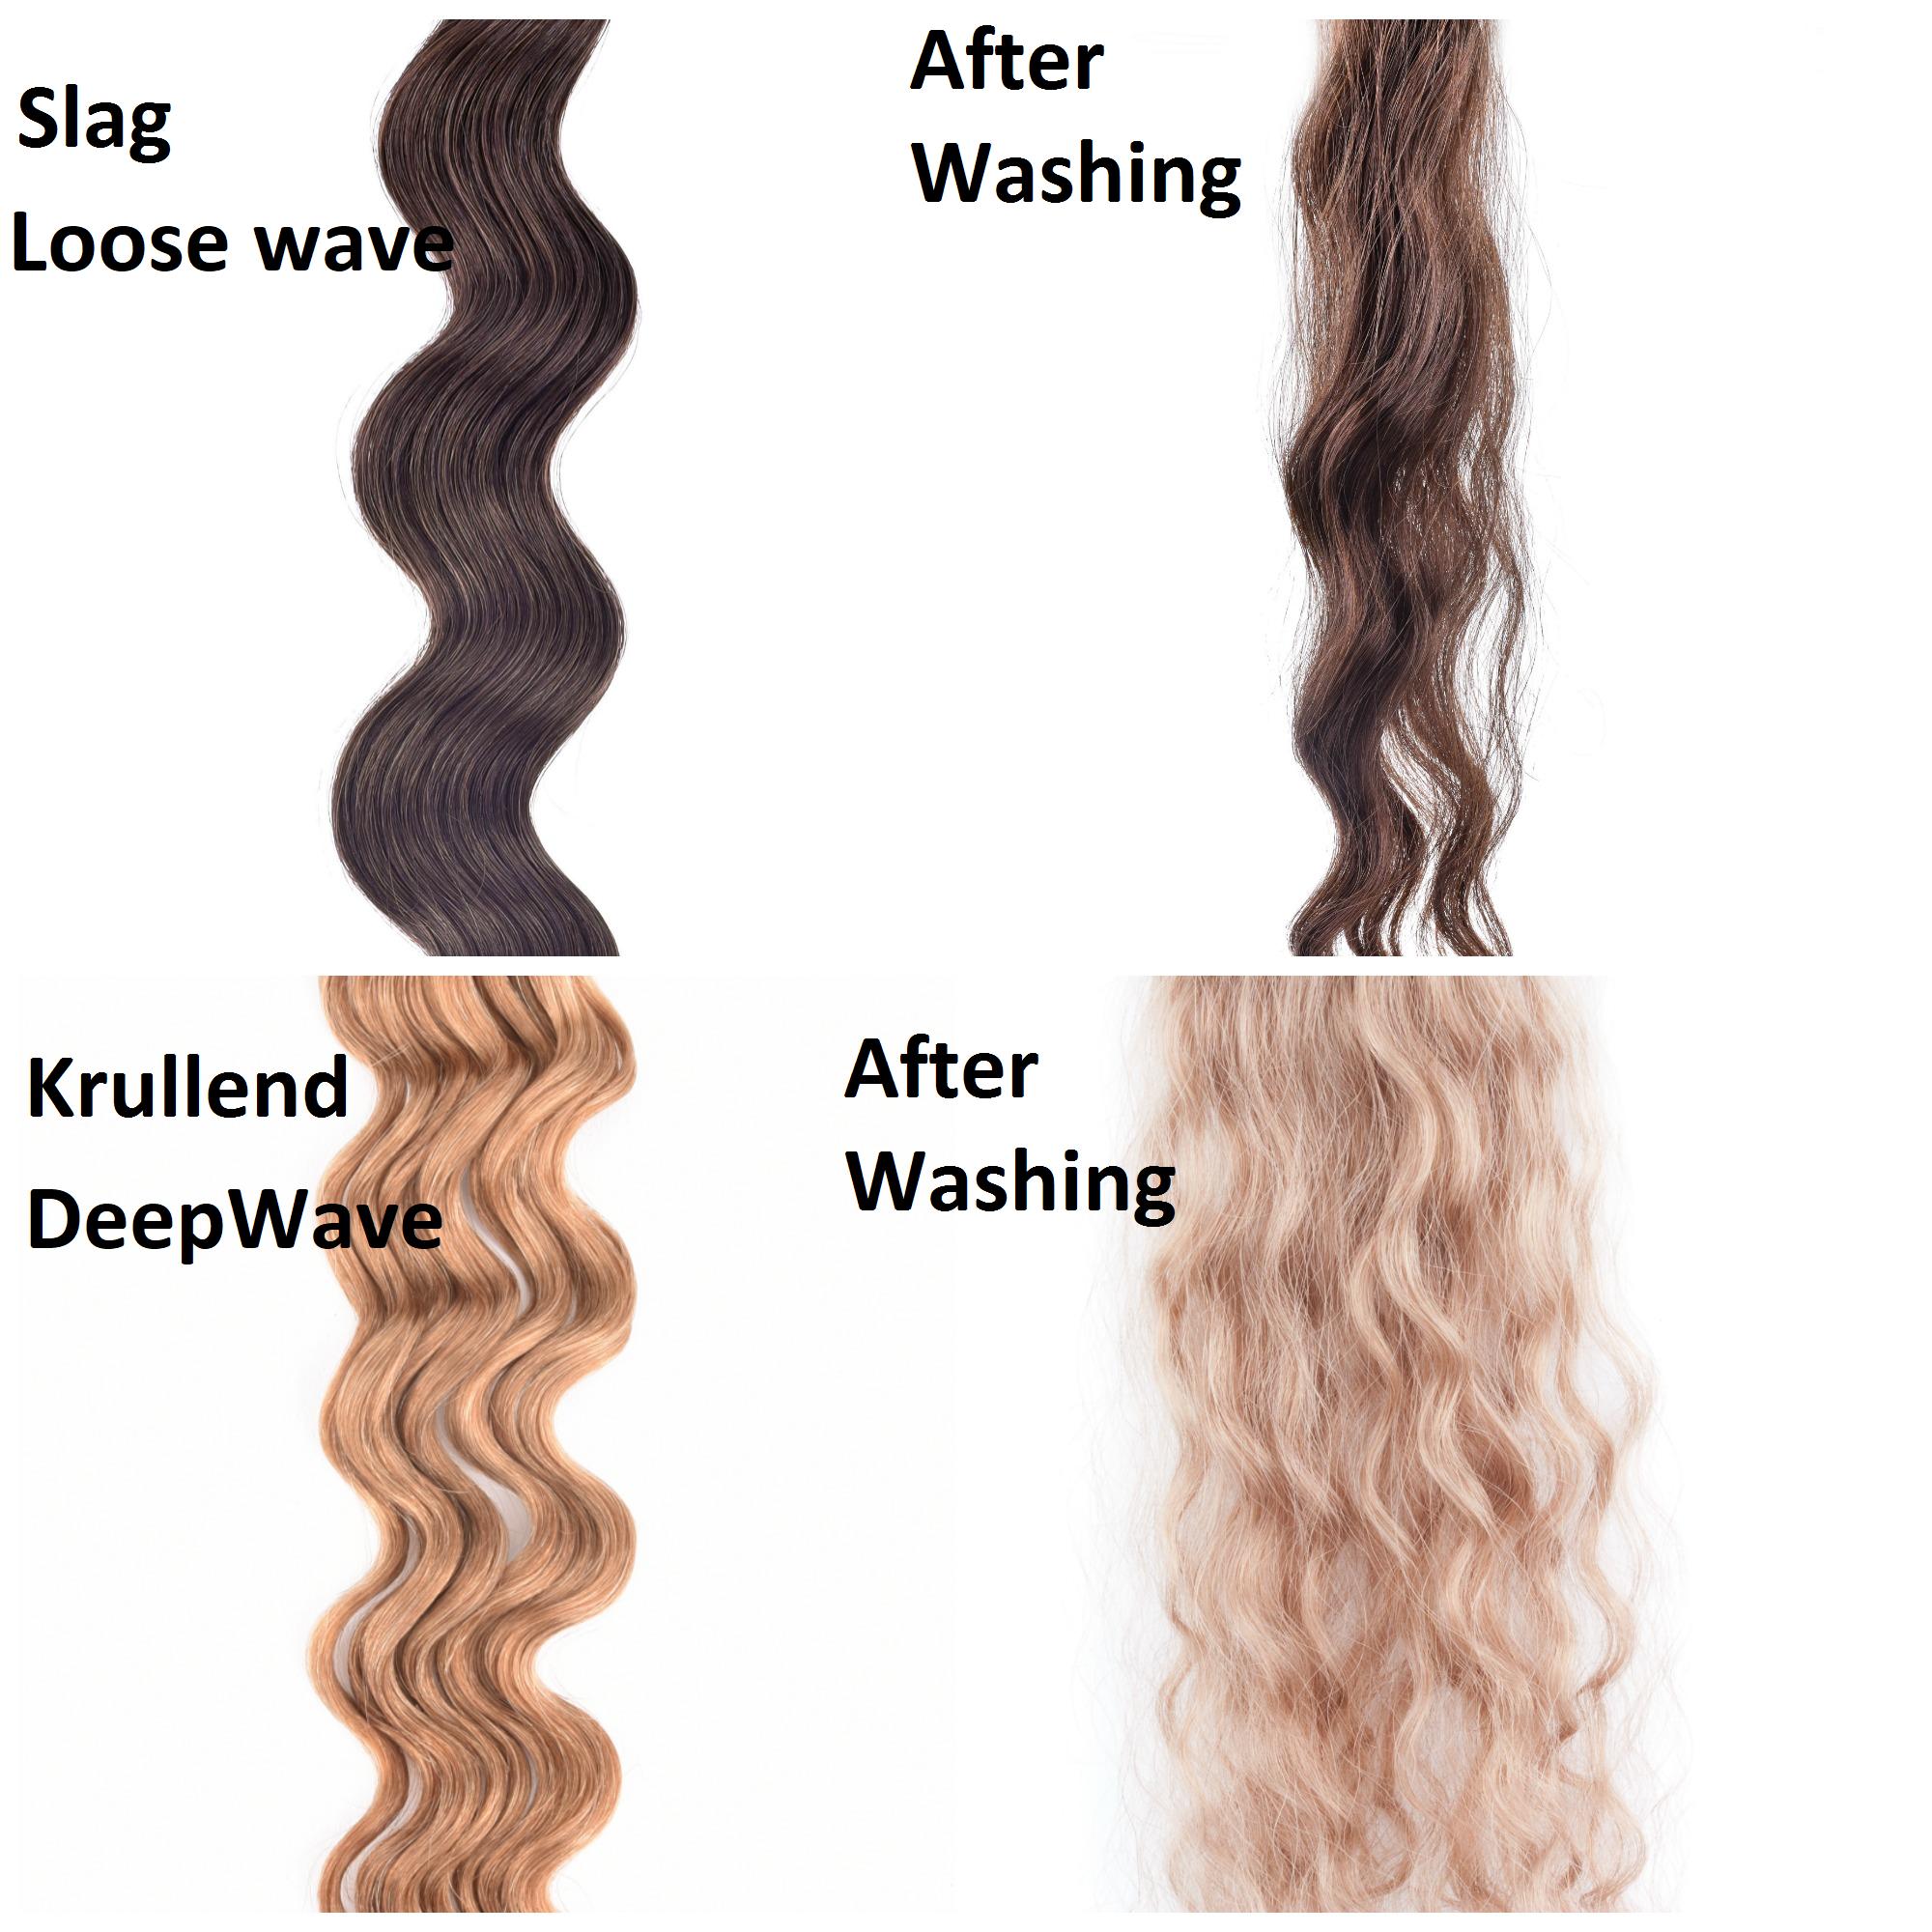 SilverFox Wax Extensions Deep Wave 55cm  #12 Ash Blonde